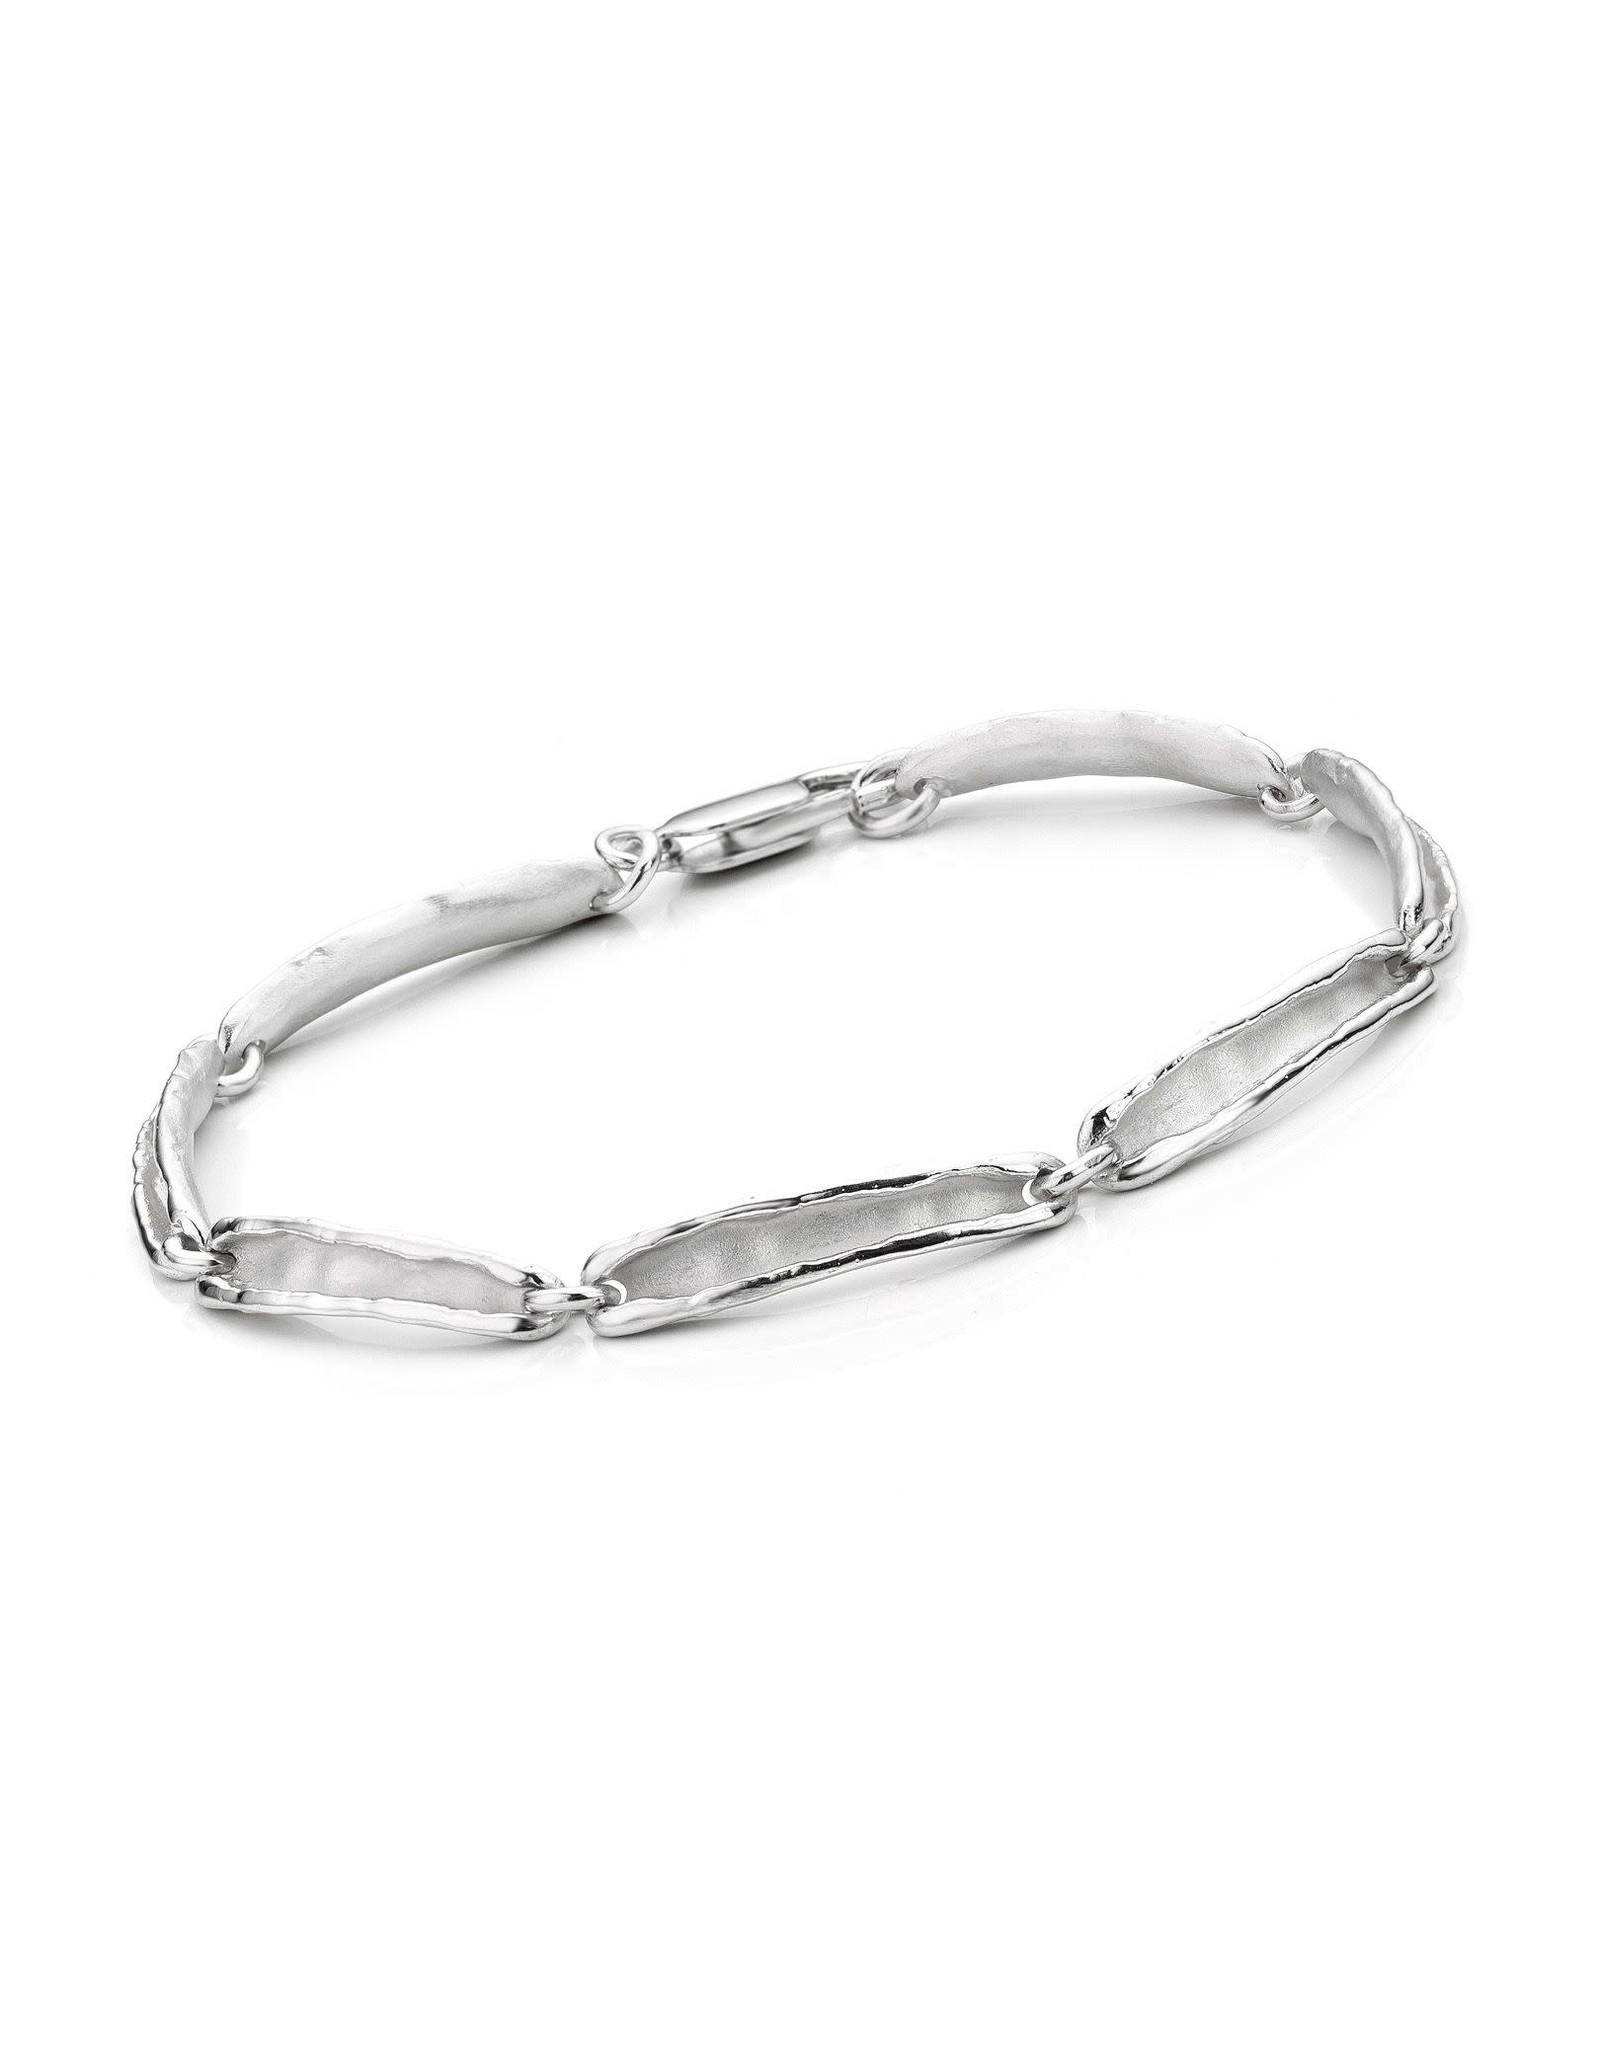 Mathisse by Stevigny Armband Mathisse by Stevigny A3